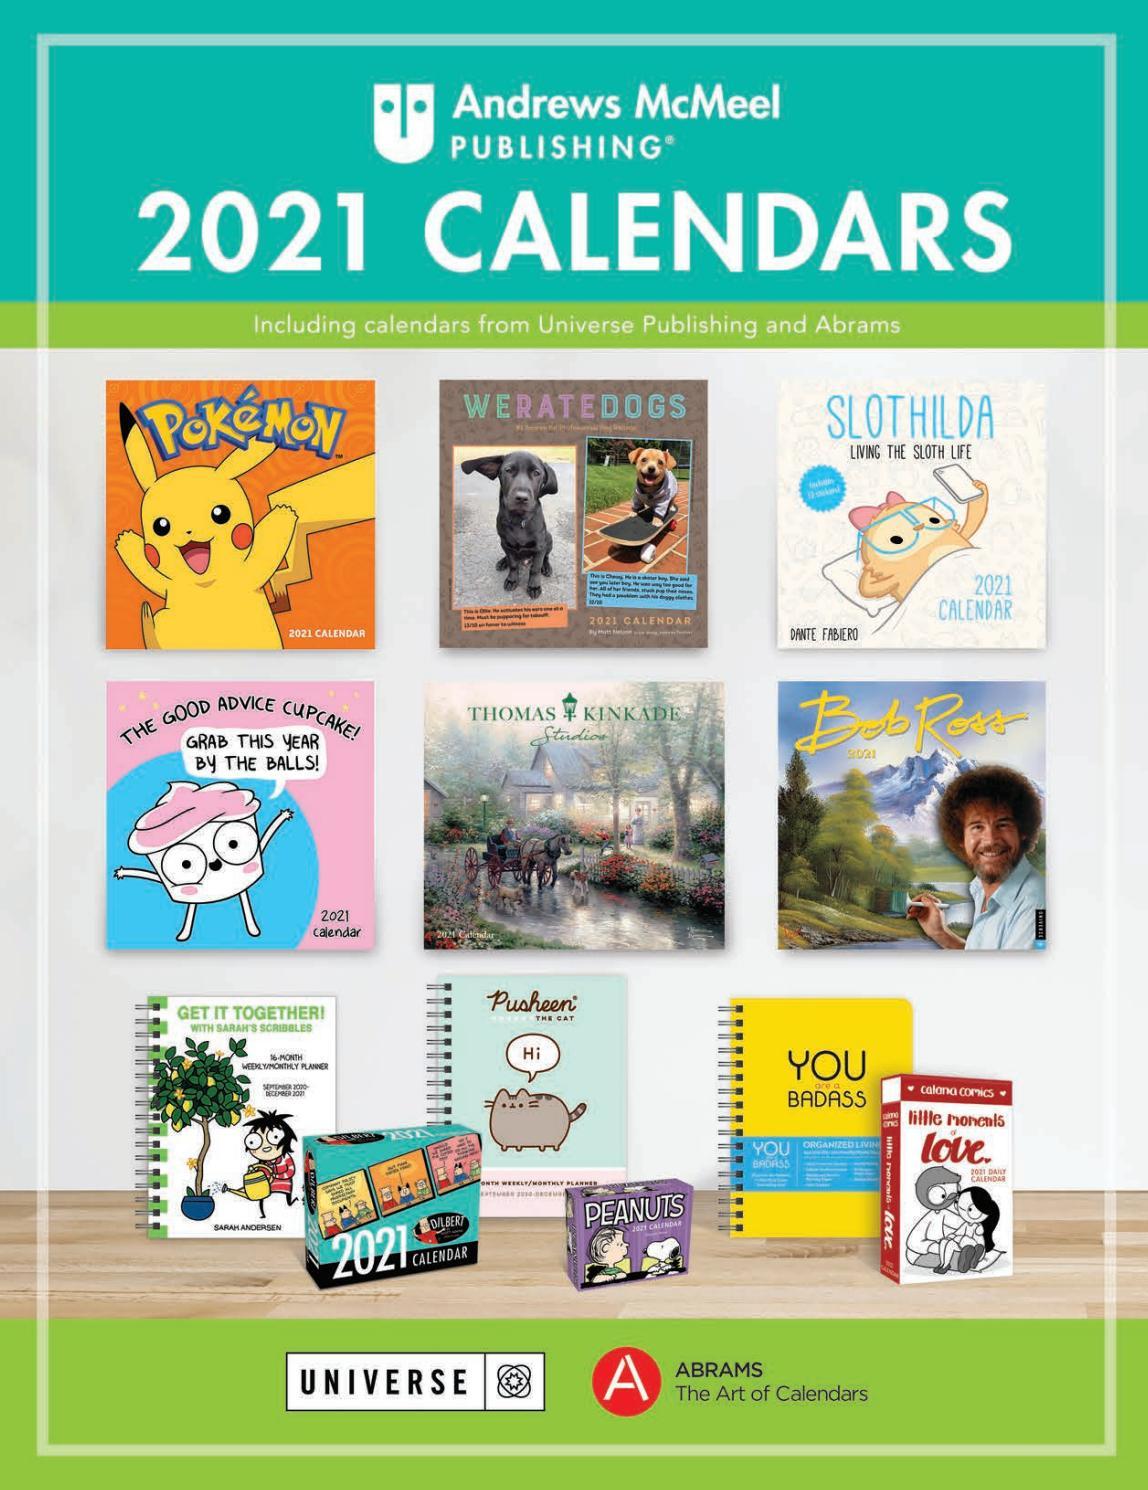 Andrews Mcmeel 2021 Calendar Catalogandrews Mcmeel in Nc Pick 3 2021 Calendar